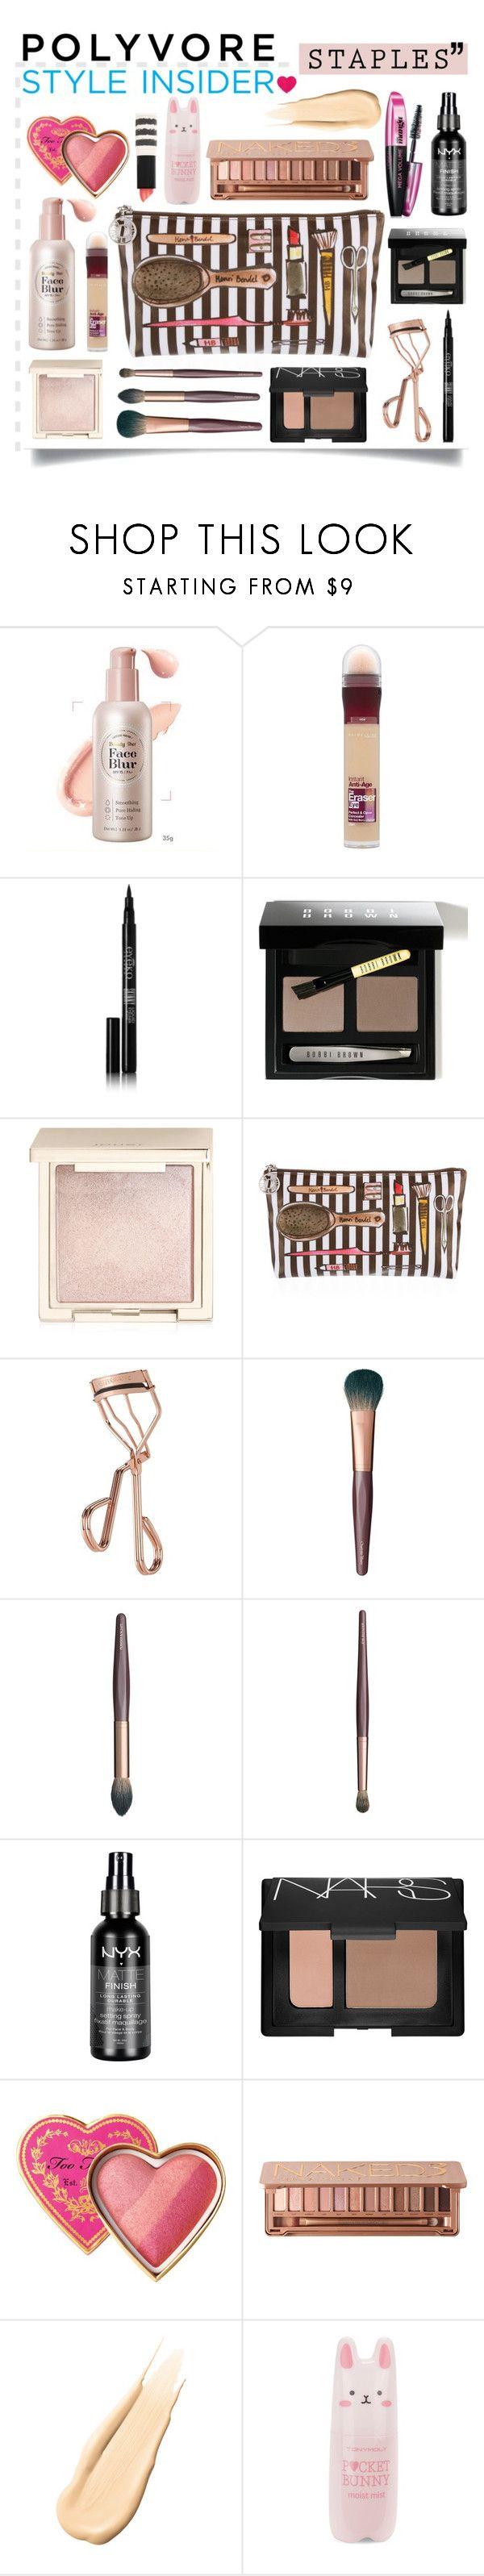 """makeup staples"" by emyemoemu ❤ liked on Polyvore featuring beauty, Maybelline, Eyeko, Bobbi Brown Cosmetics, Jouer, Henri Bendel, Tweezerman, Charlotte Tilbury, NYX and NARS Cosmetics"